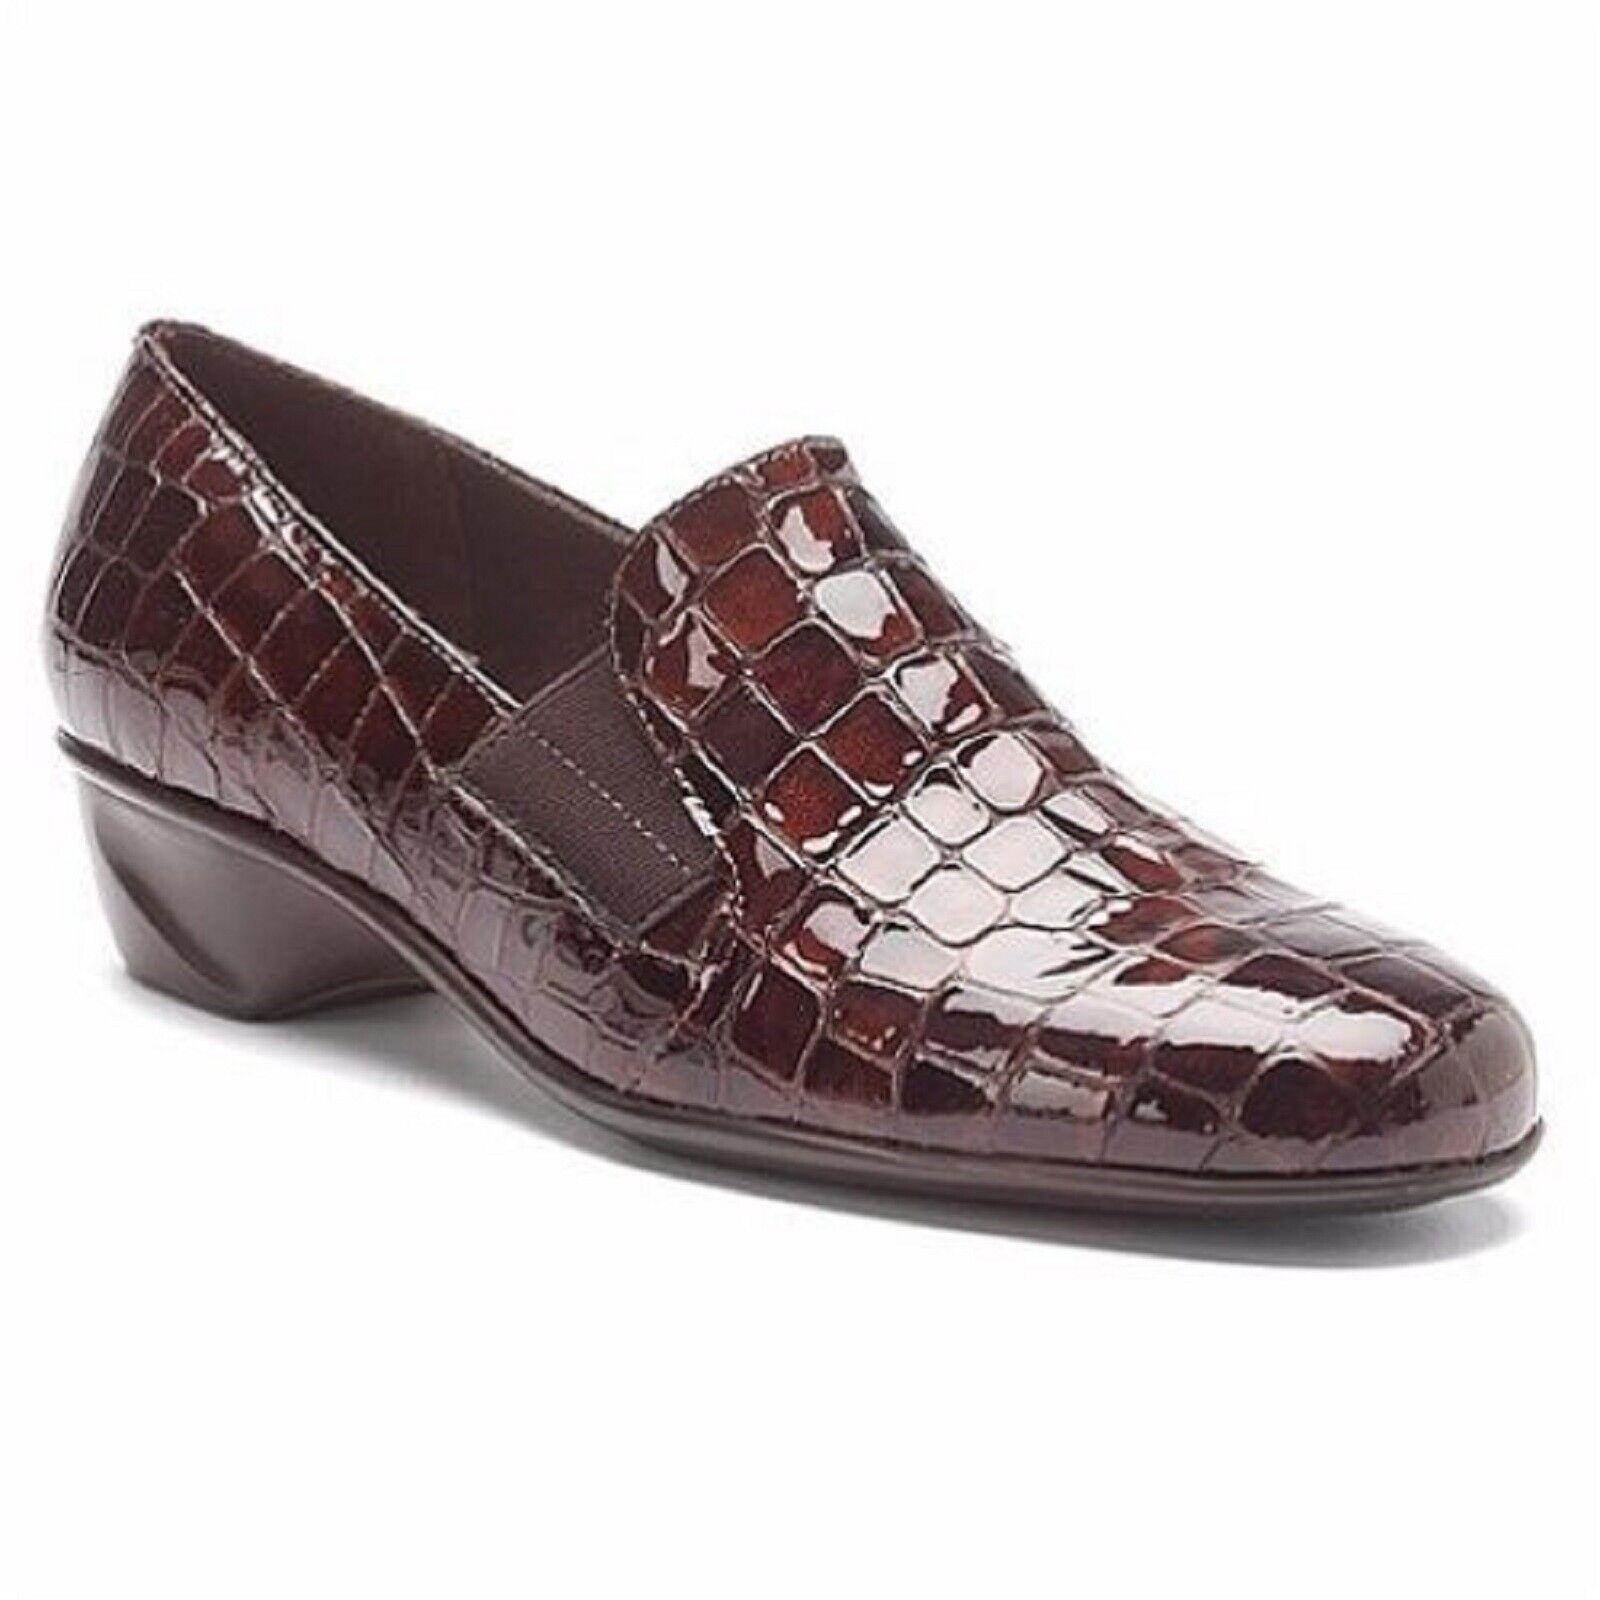 prezzo basso WALKING CRADLES Ladies TERI Patent Leather Marrone Snake Print Print Print Loafers Sz. 6 M NIB  godendo i tuoi acquisti